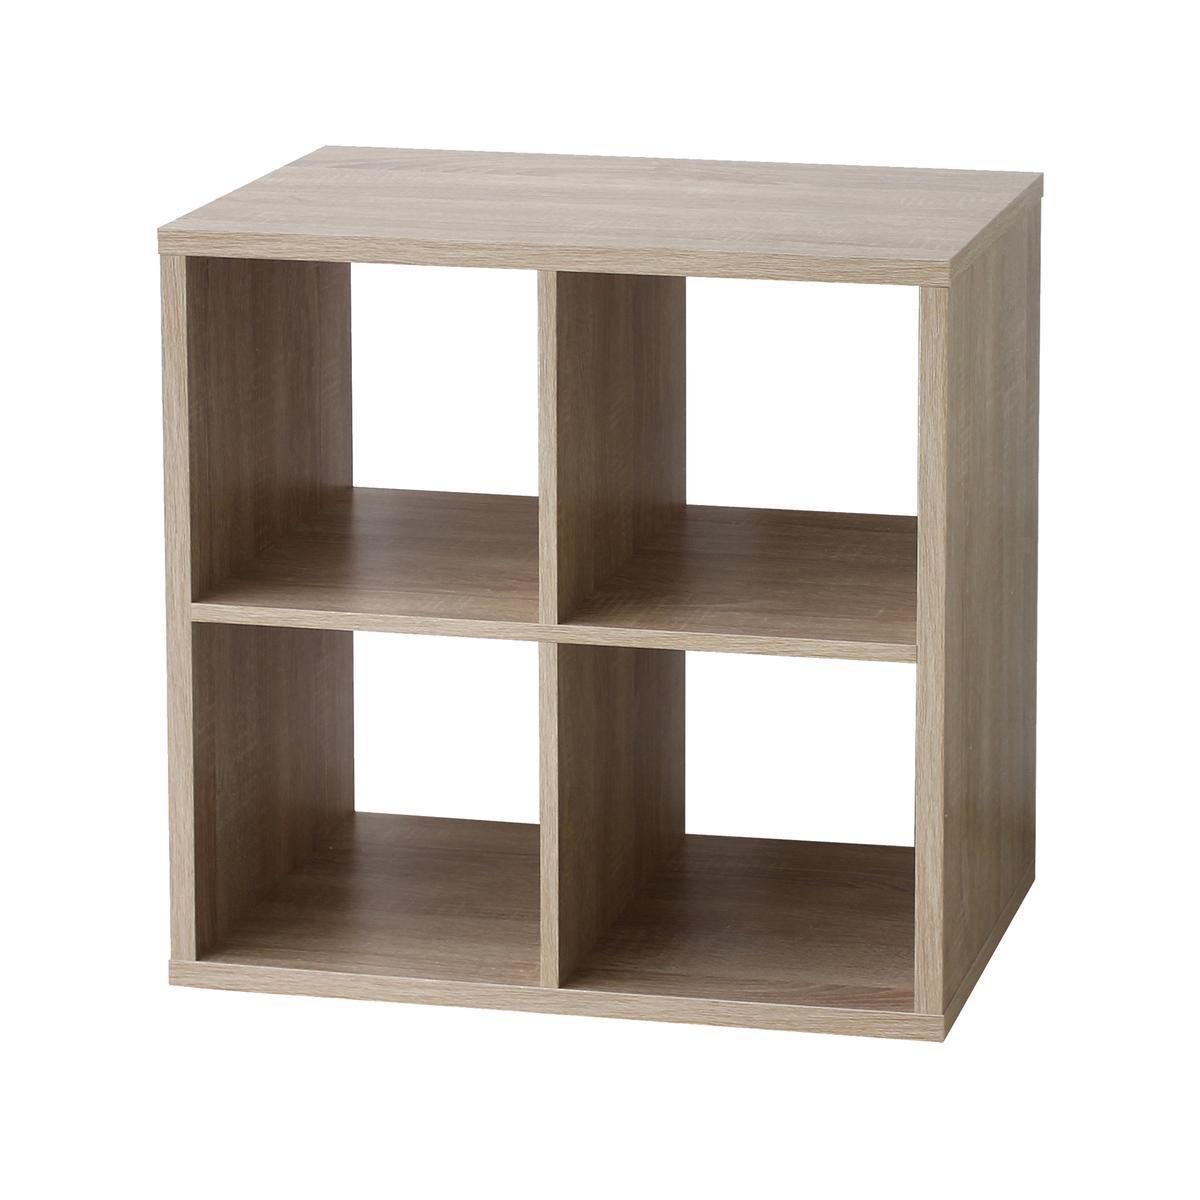 etagere cube 4 cases 66 x 30 x h 66